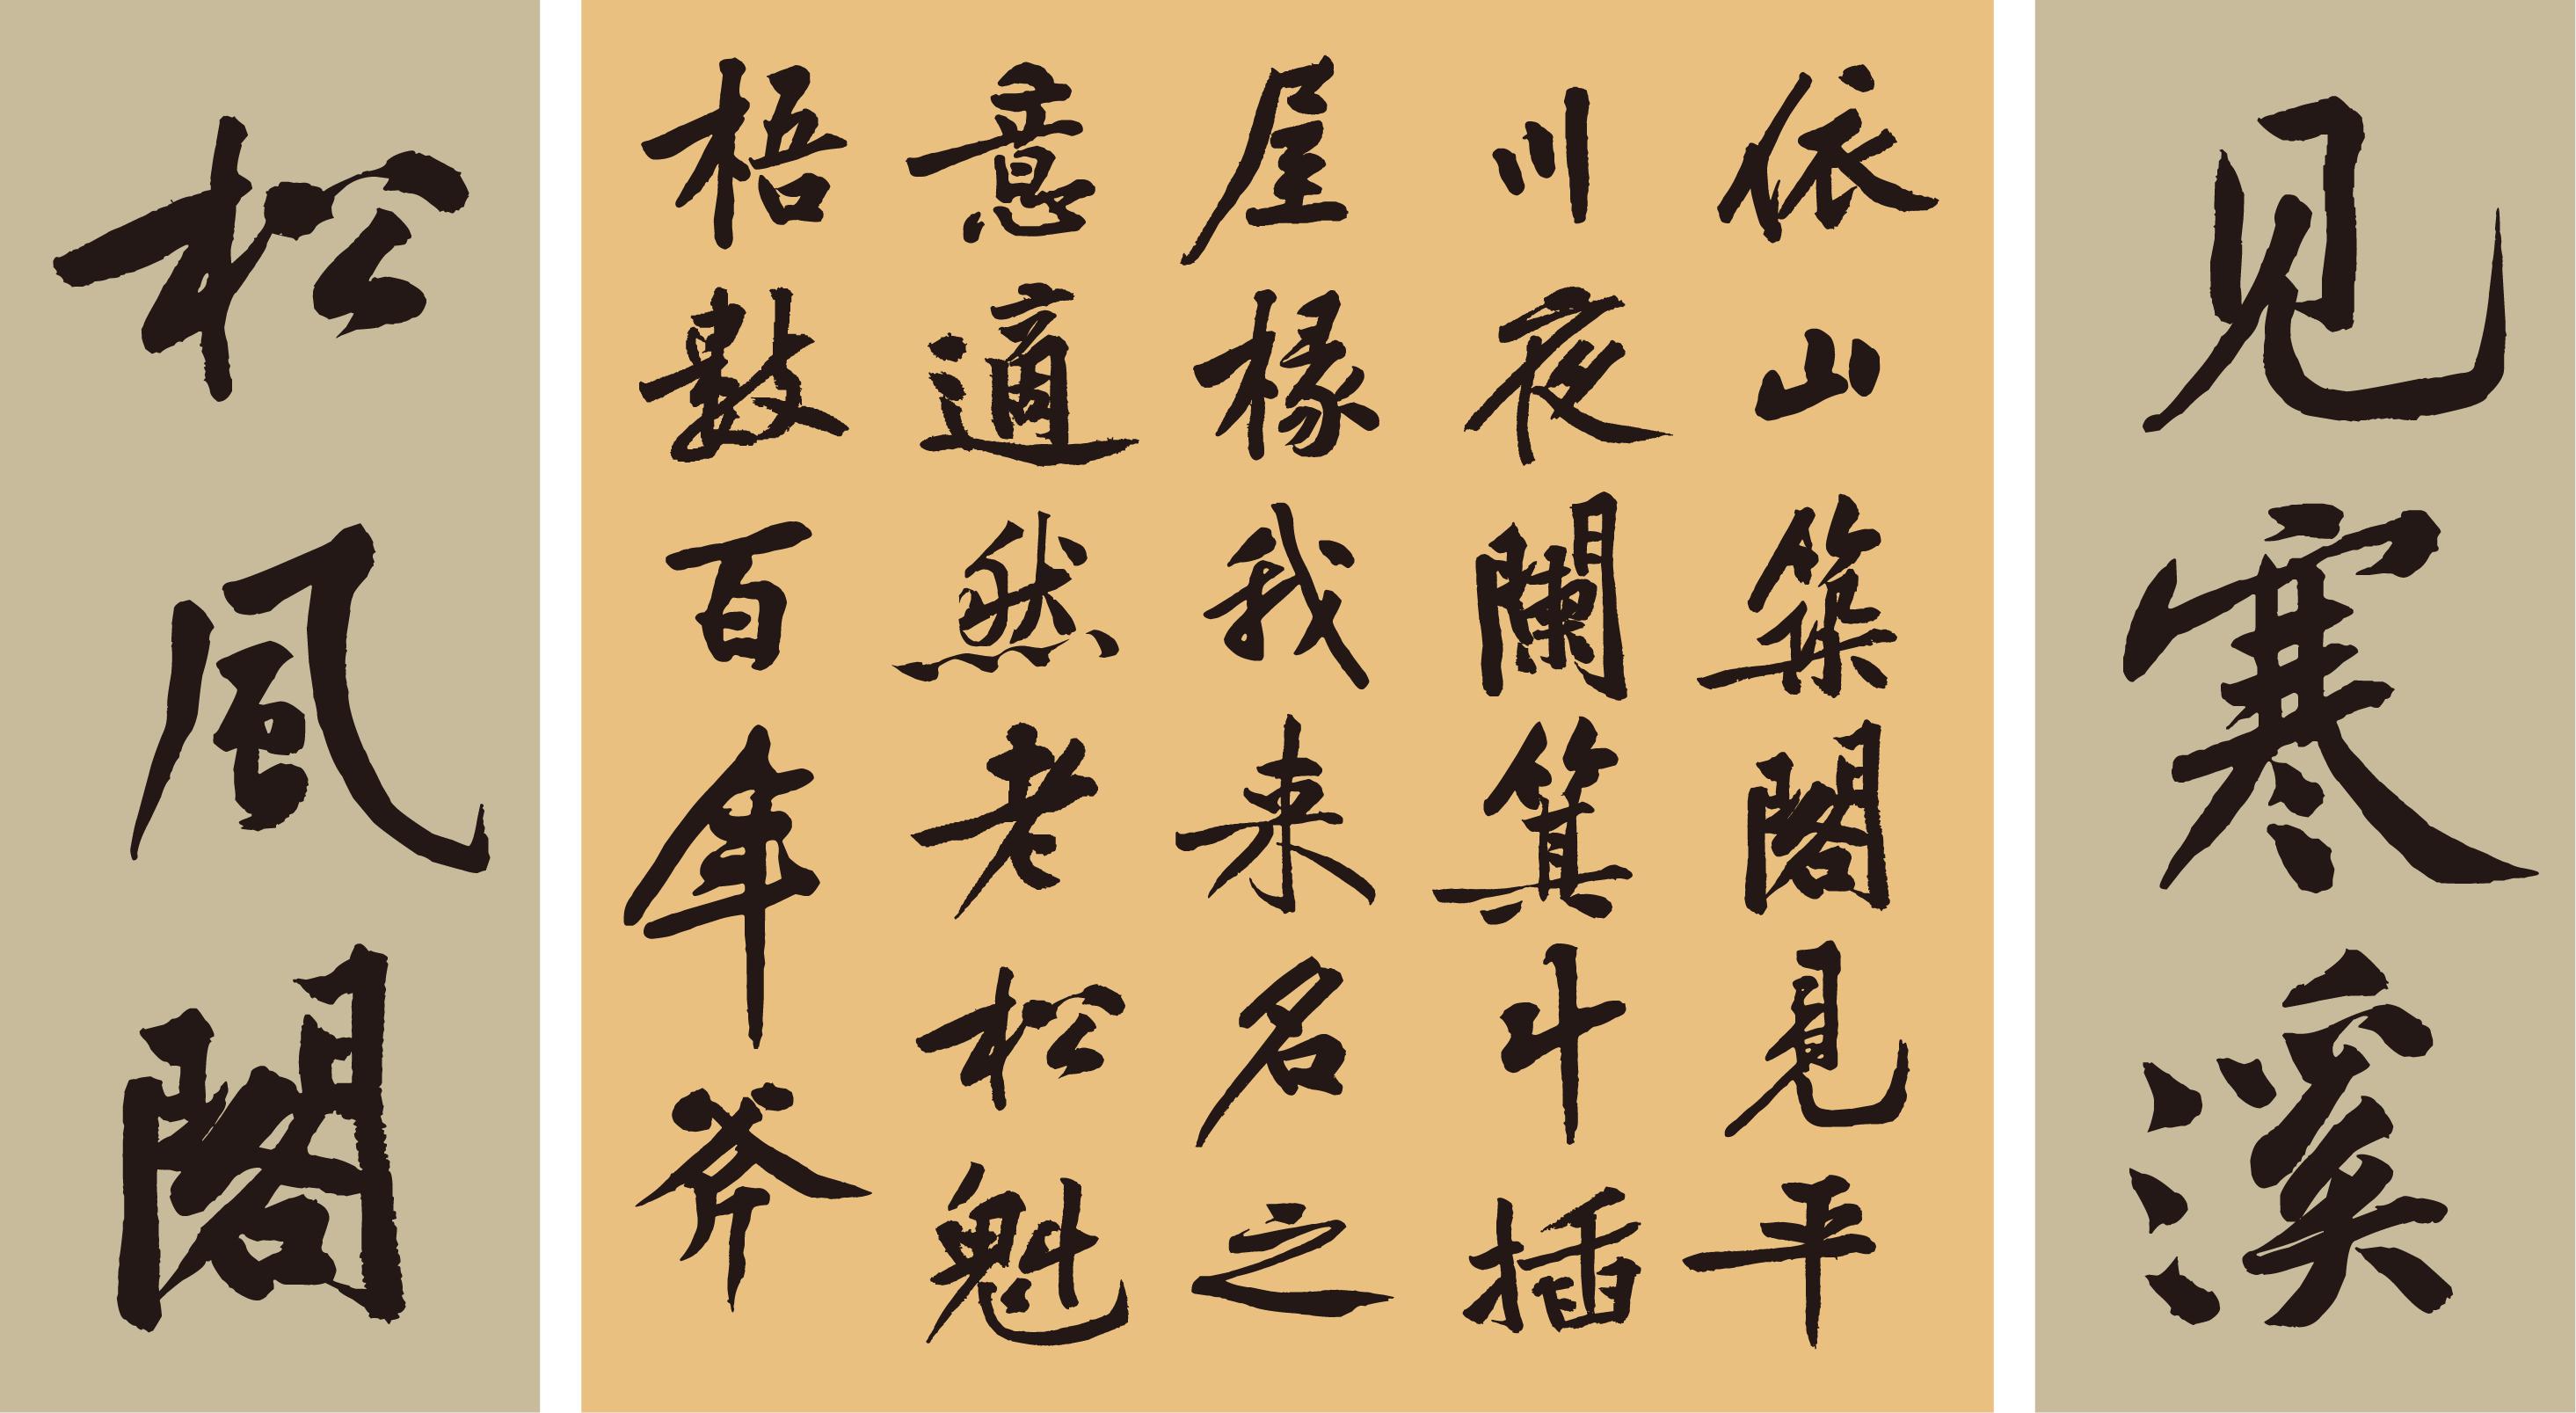 https://ft-bk1.oss-cn-zhangjiakou.aliyuncs.com/Public/Uploads/img/n_content_20201210174810_7572.png